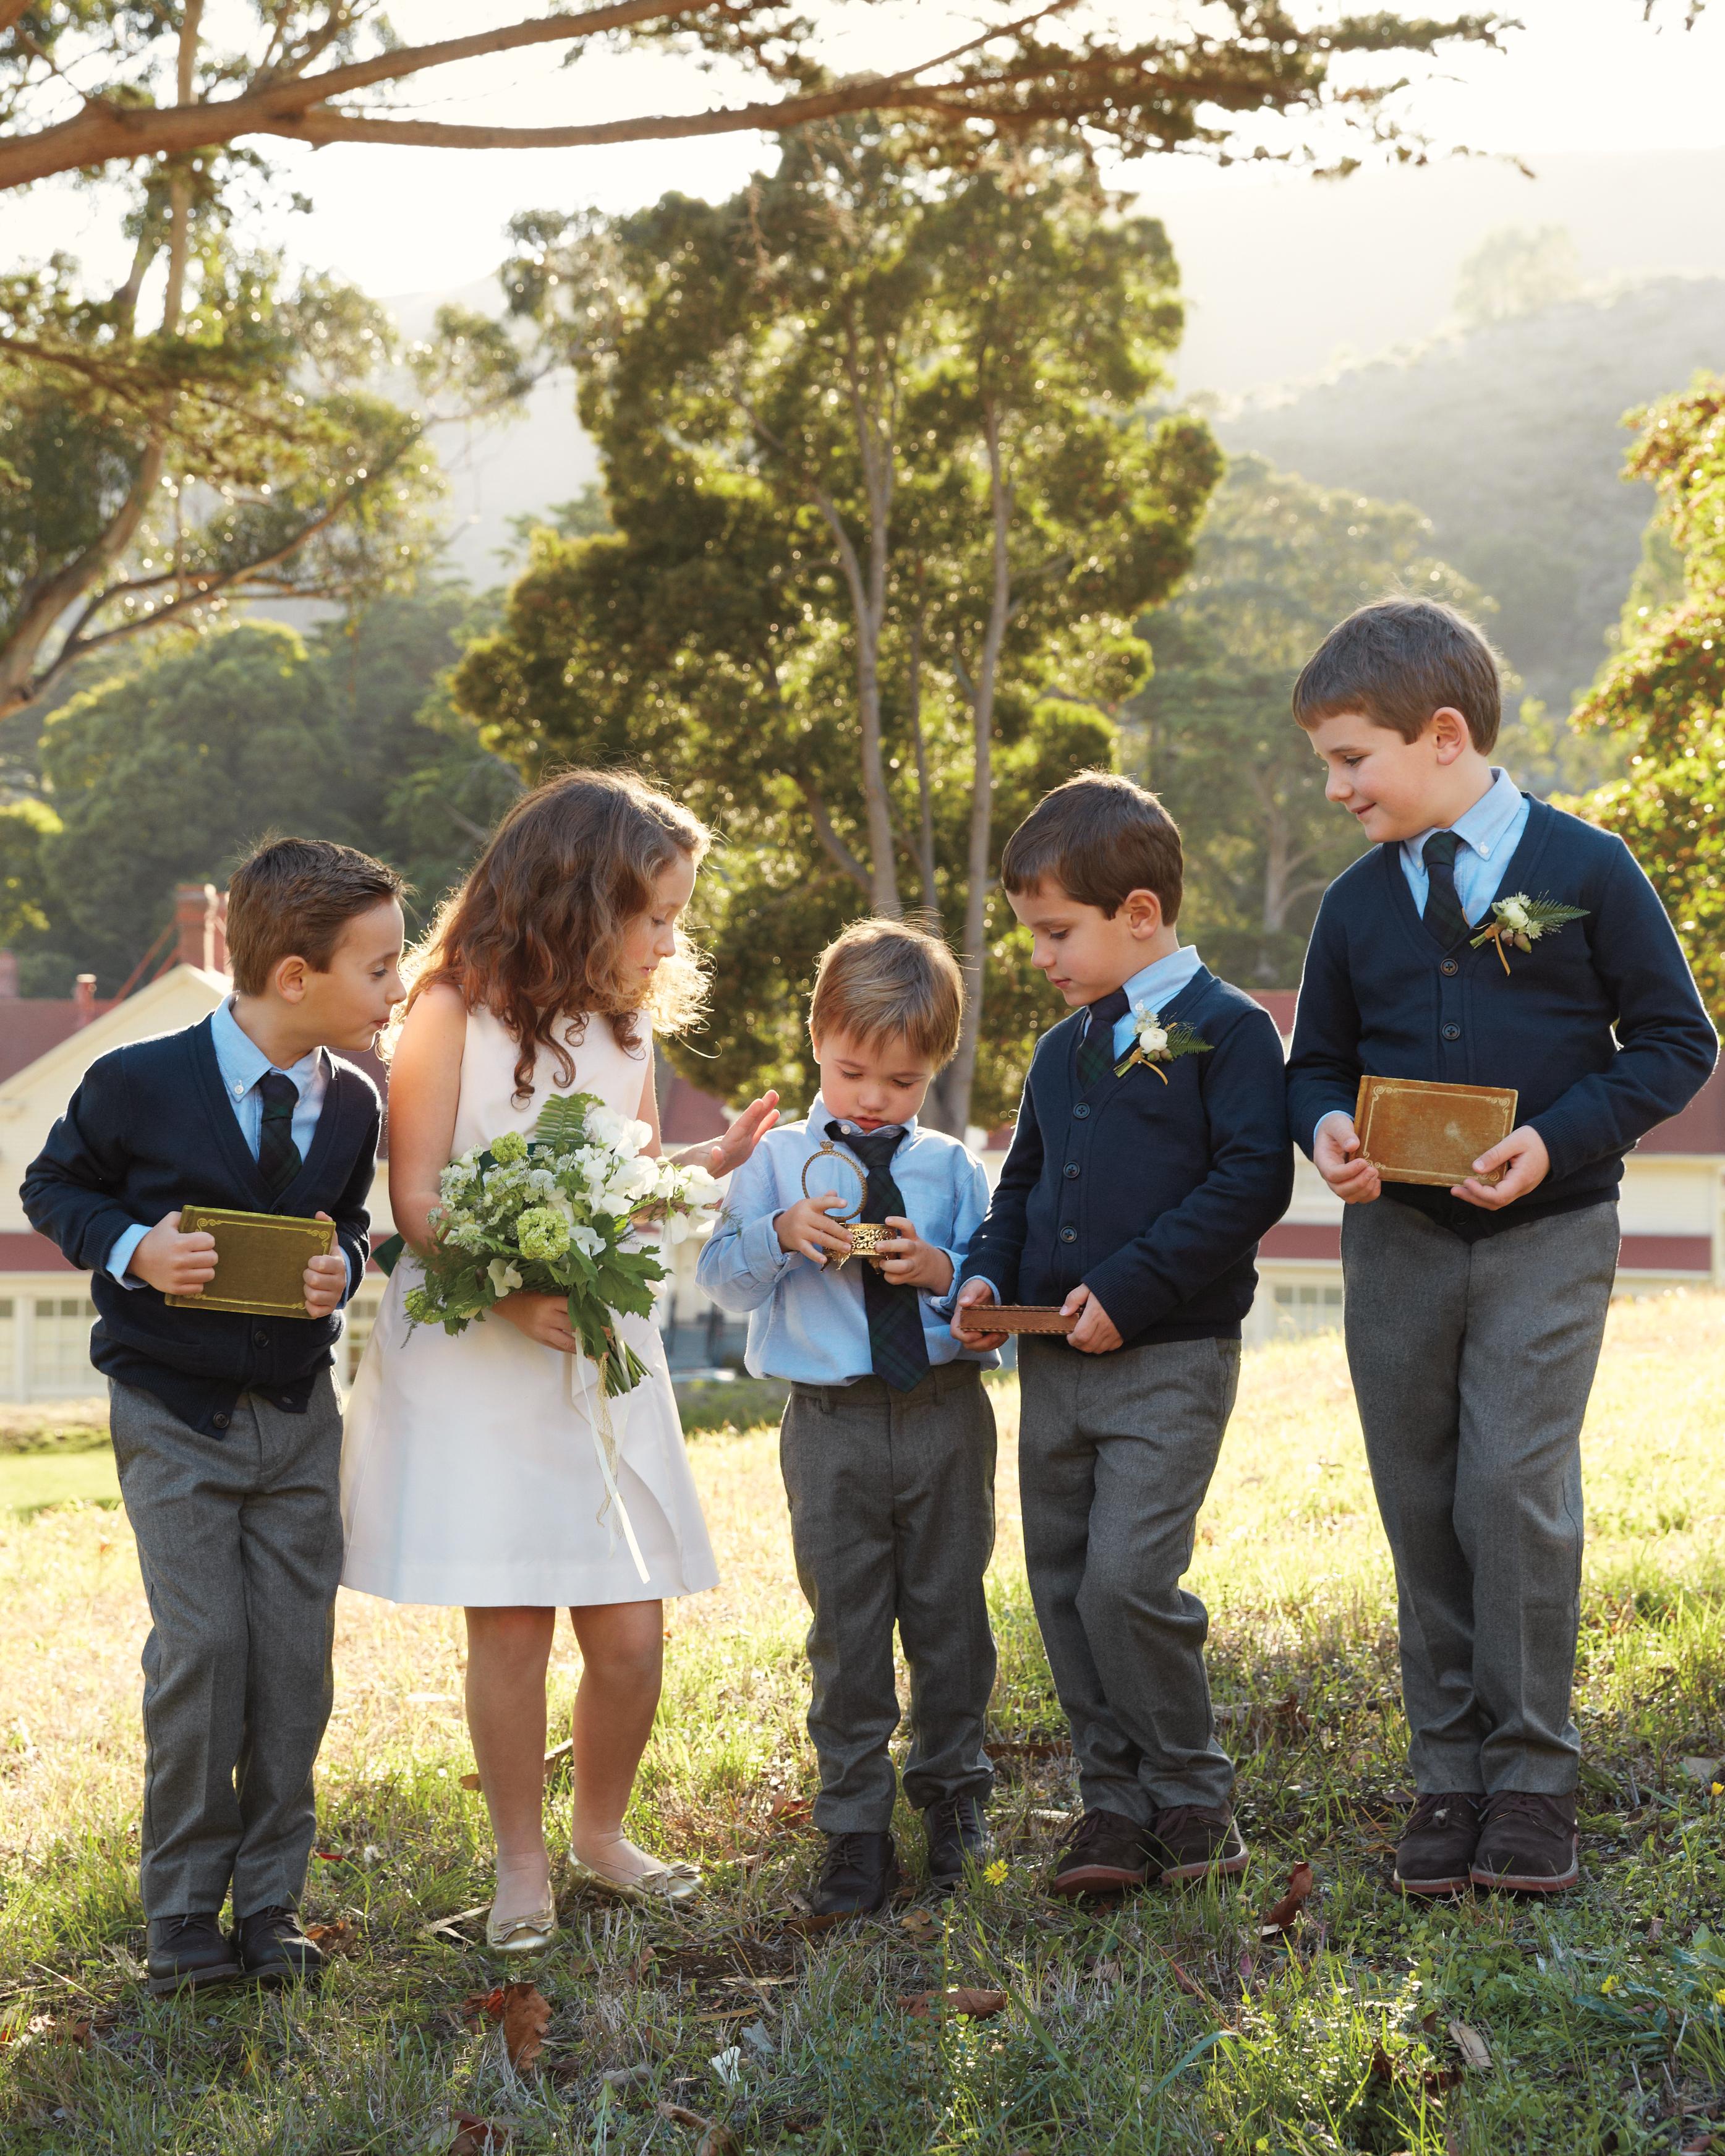 meaghan-conrad-kids-1040-mwd109593.jpg